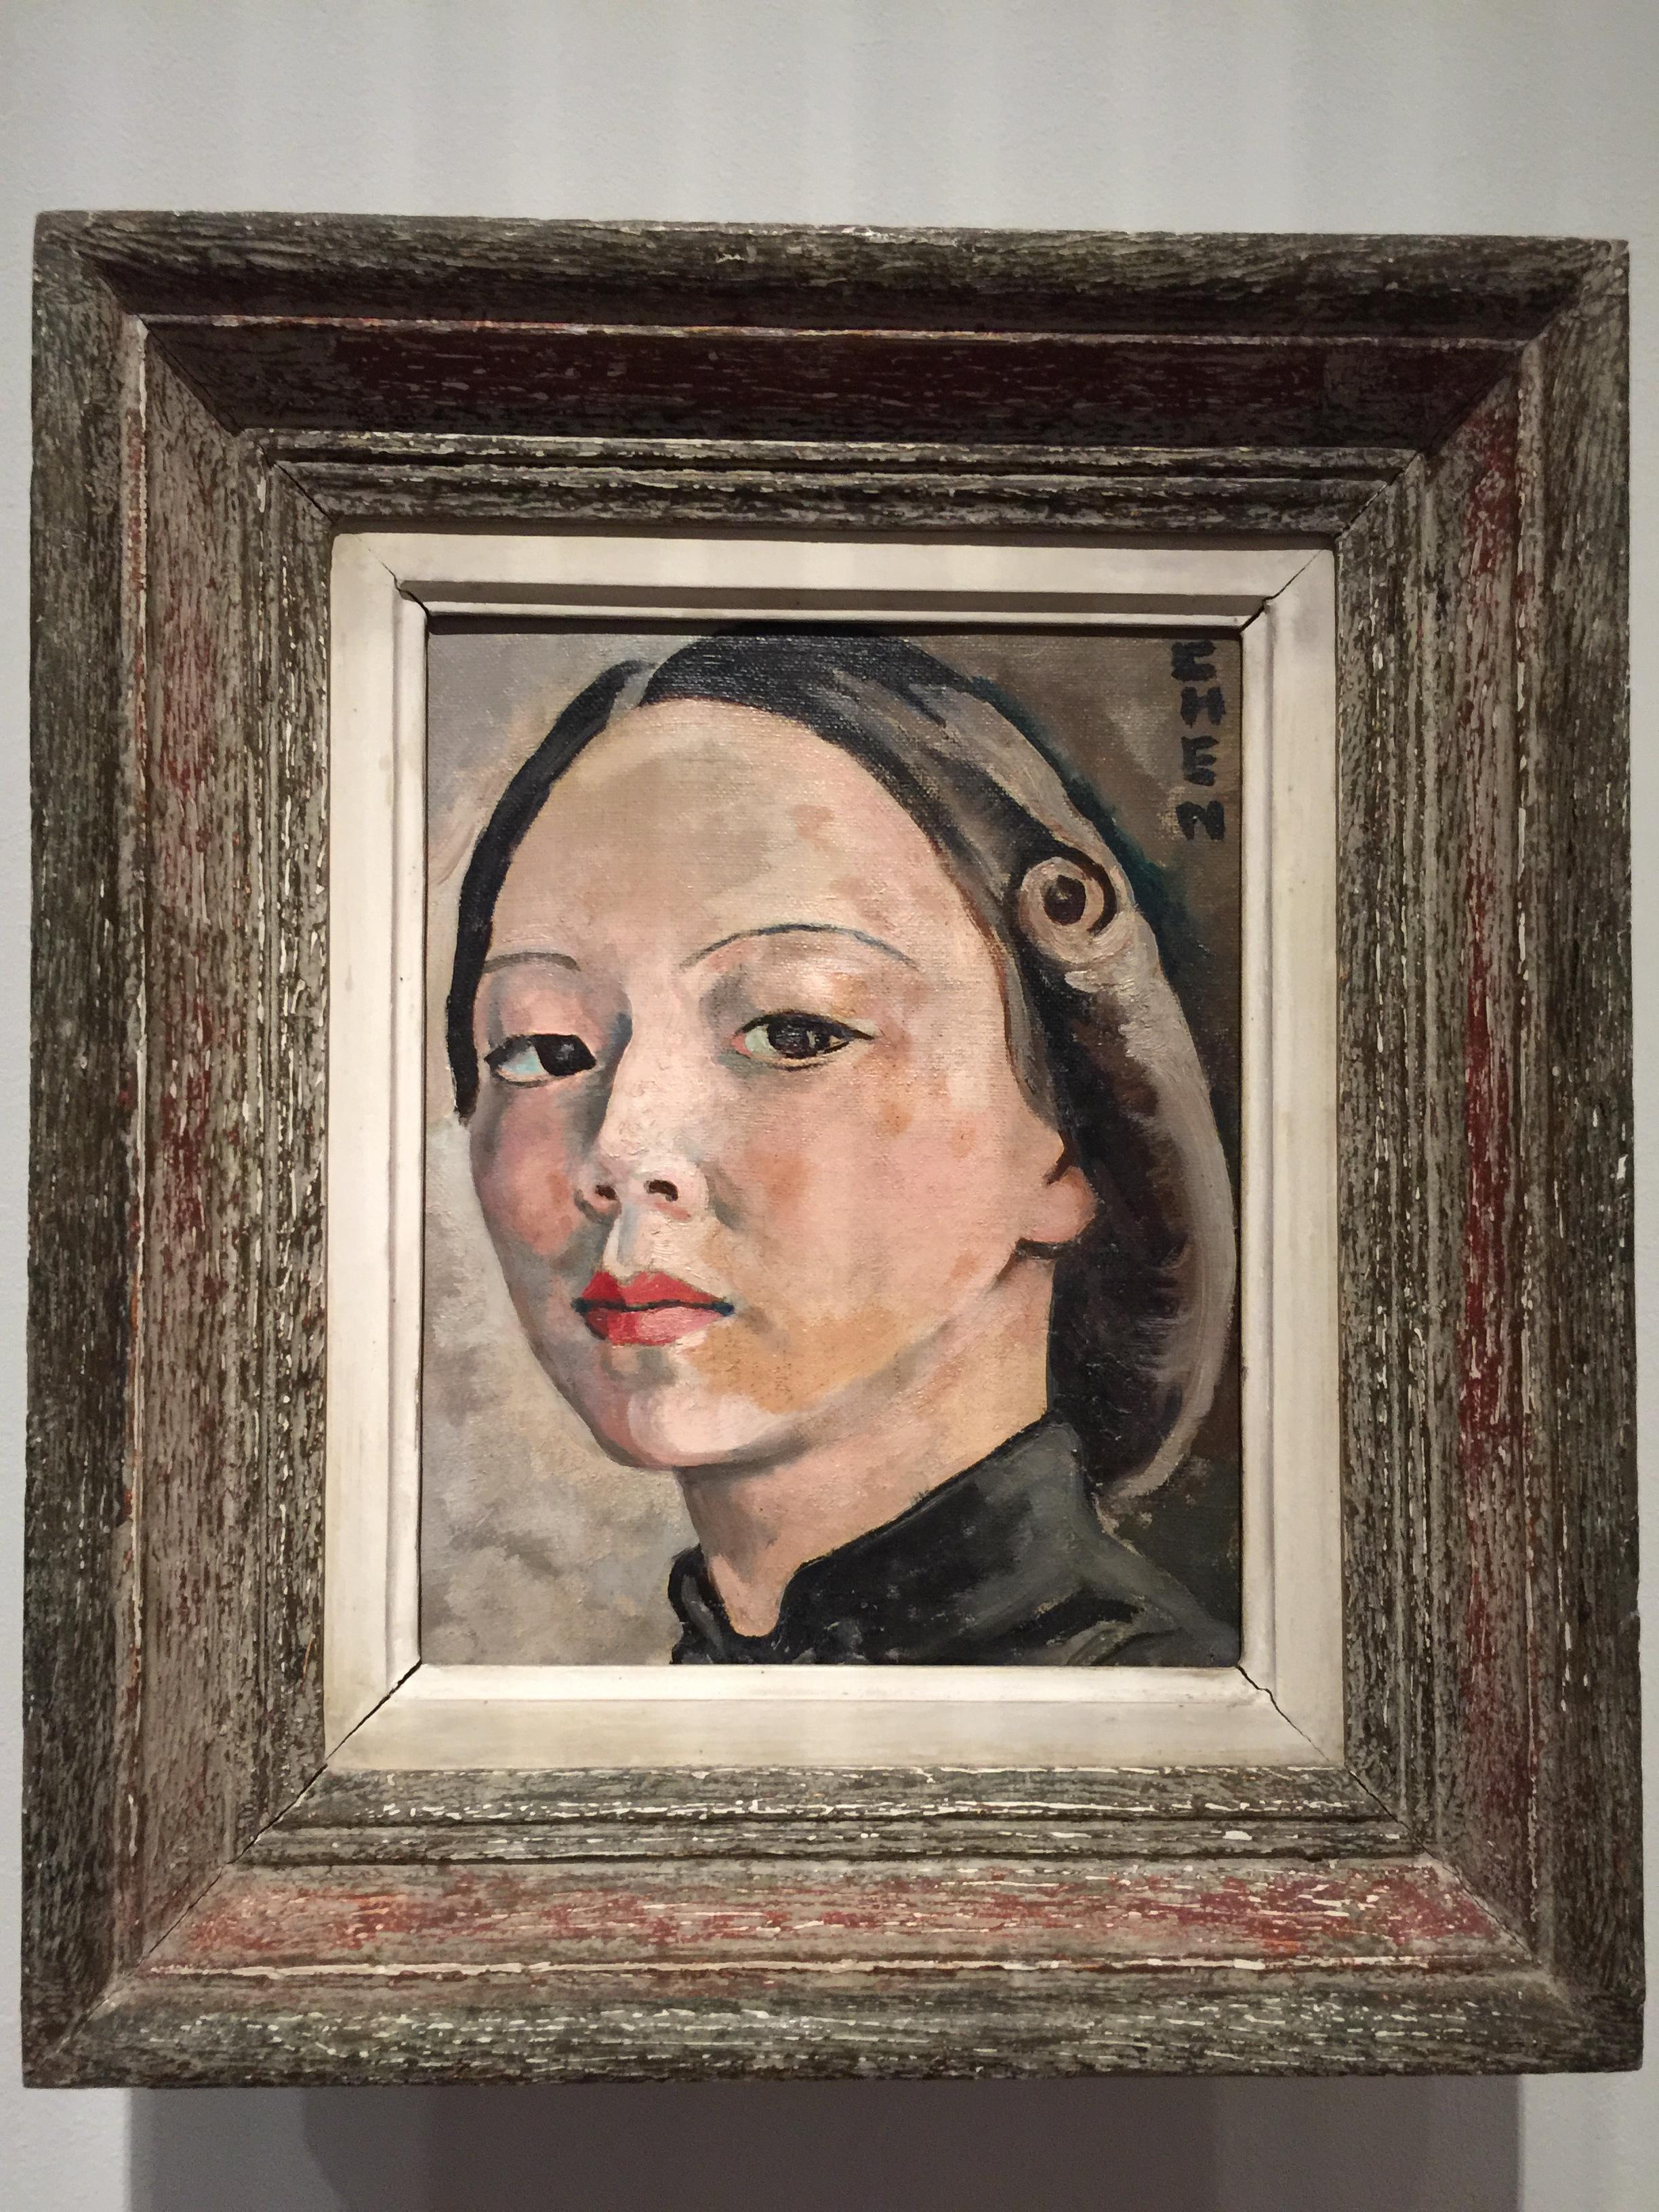 Georgette Chen, self portrait, National Gallery Singapore